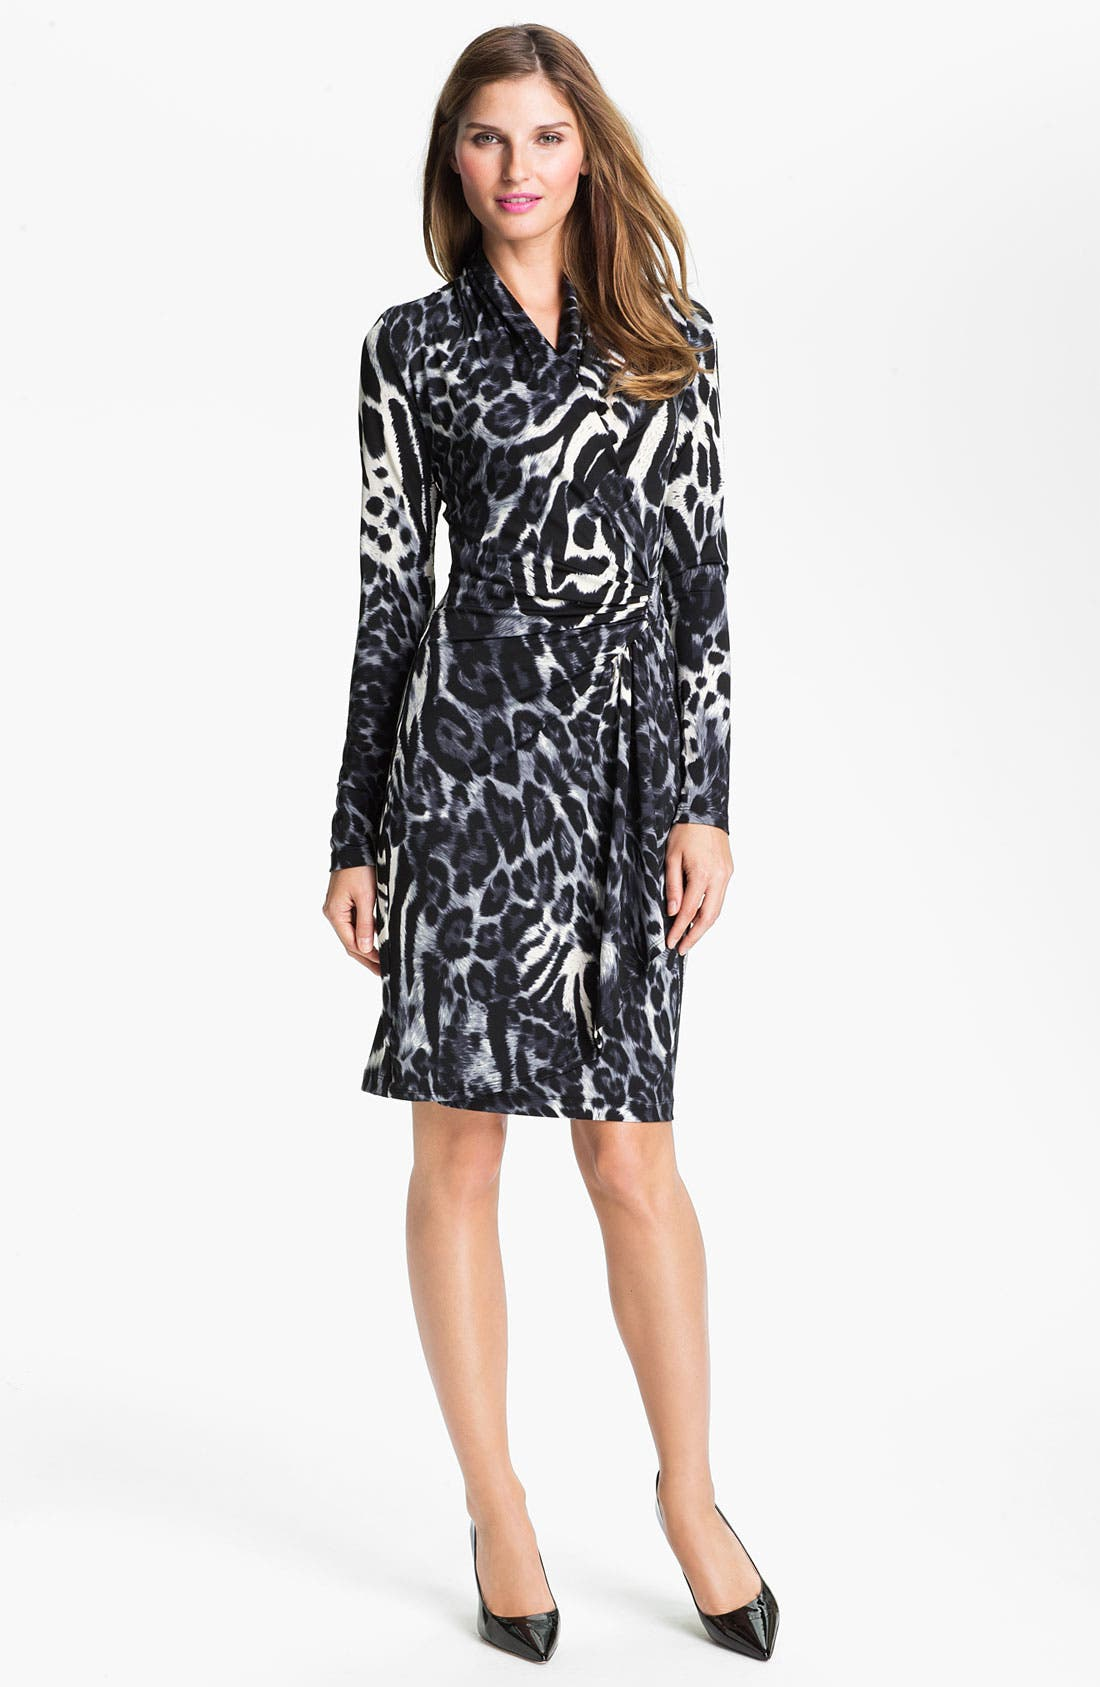 Alternate Image 1 Selected - Karen Kane Faux Wrap Dress (Online Exclusive)